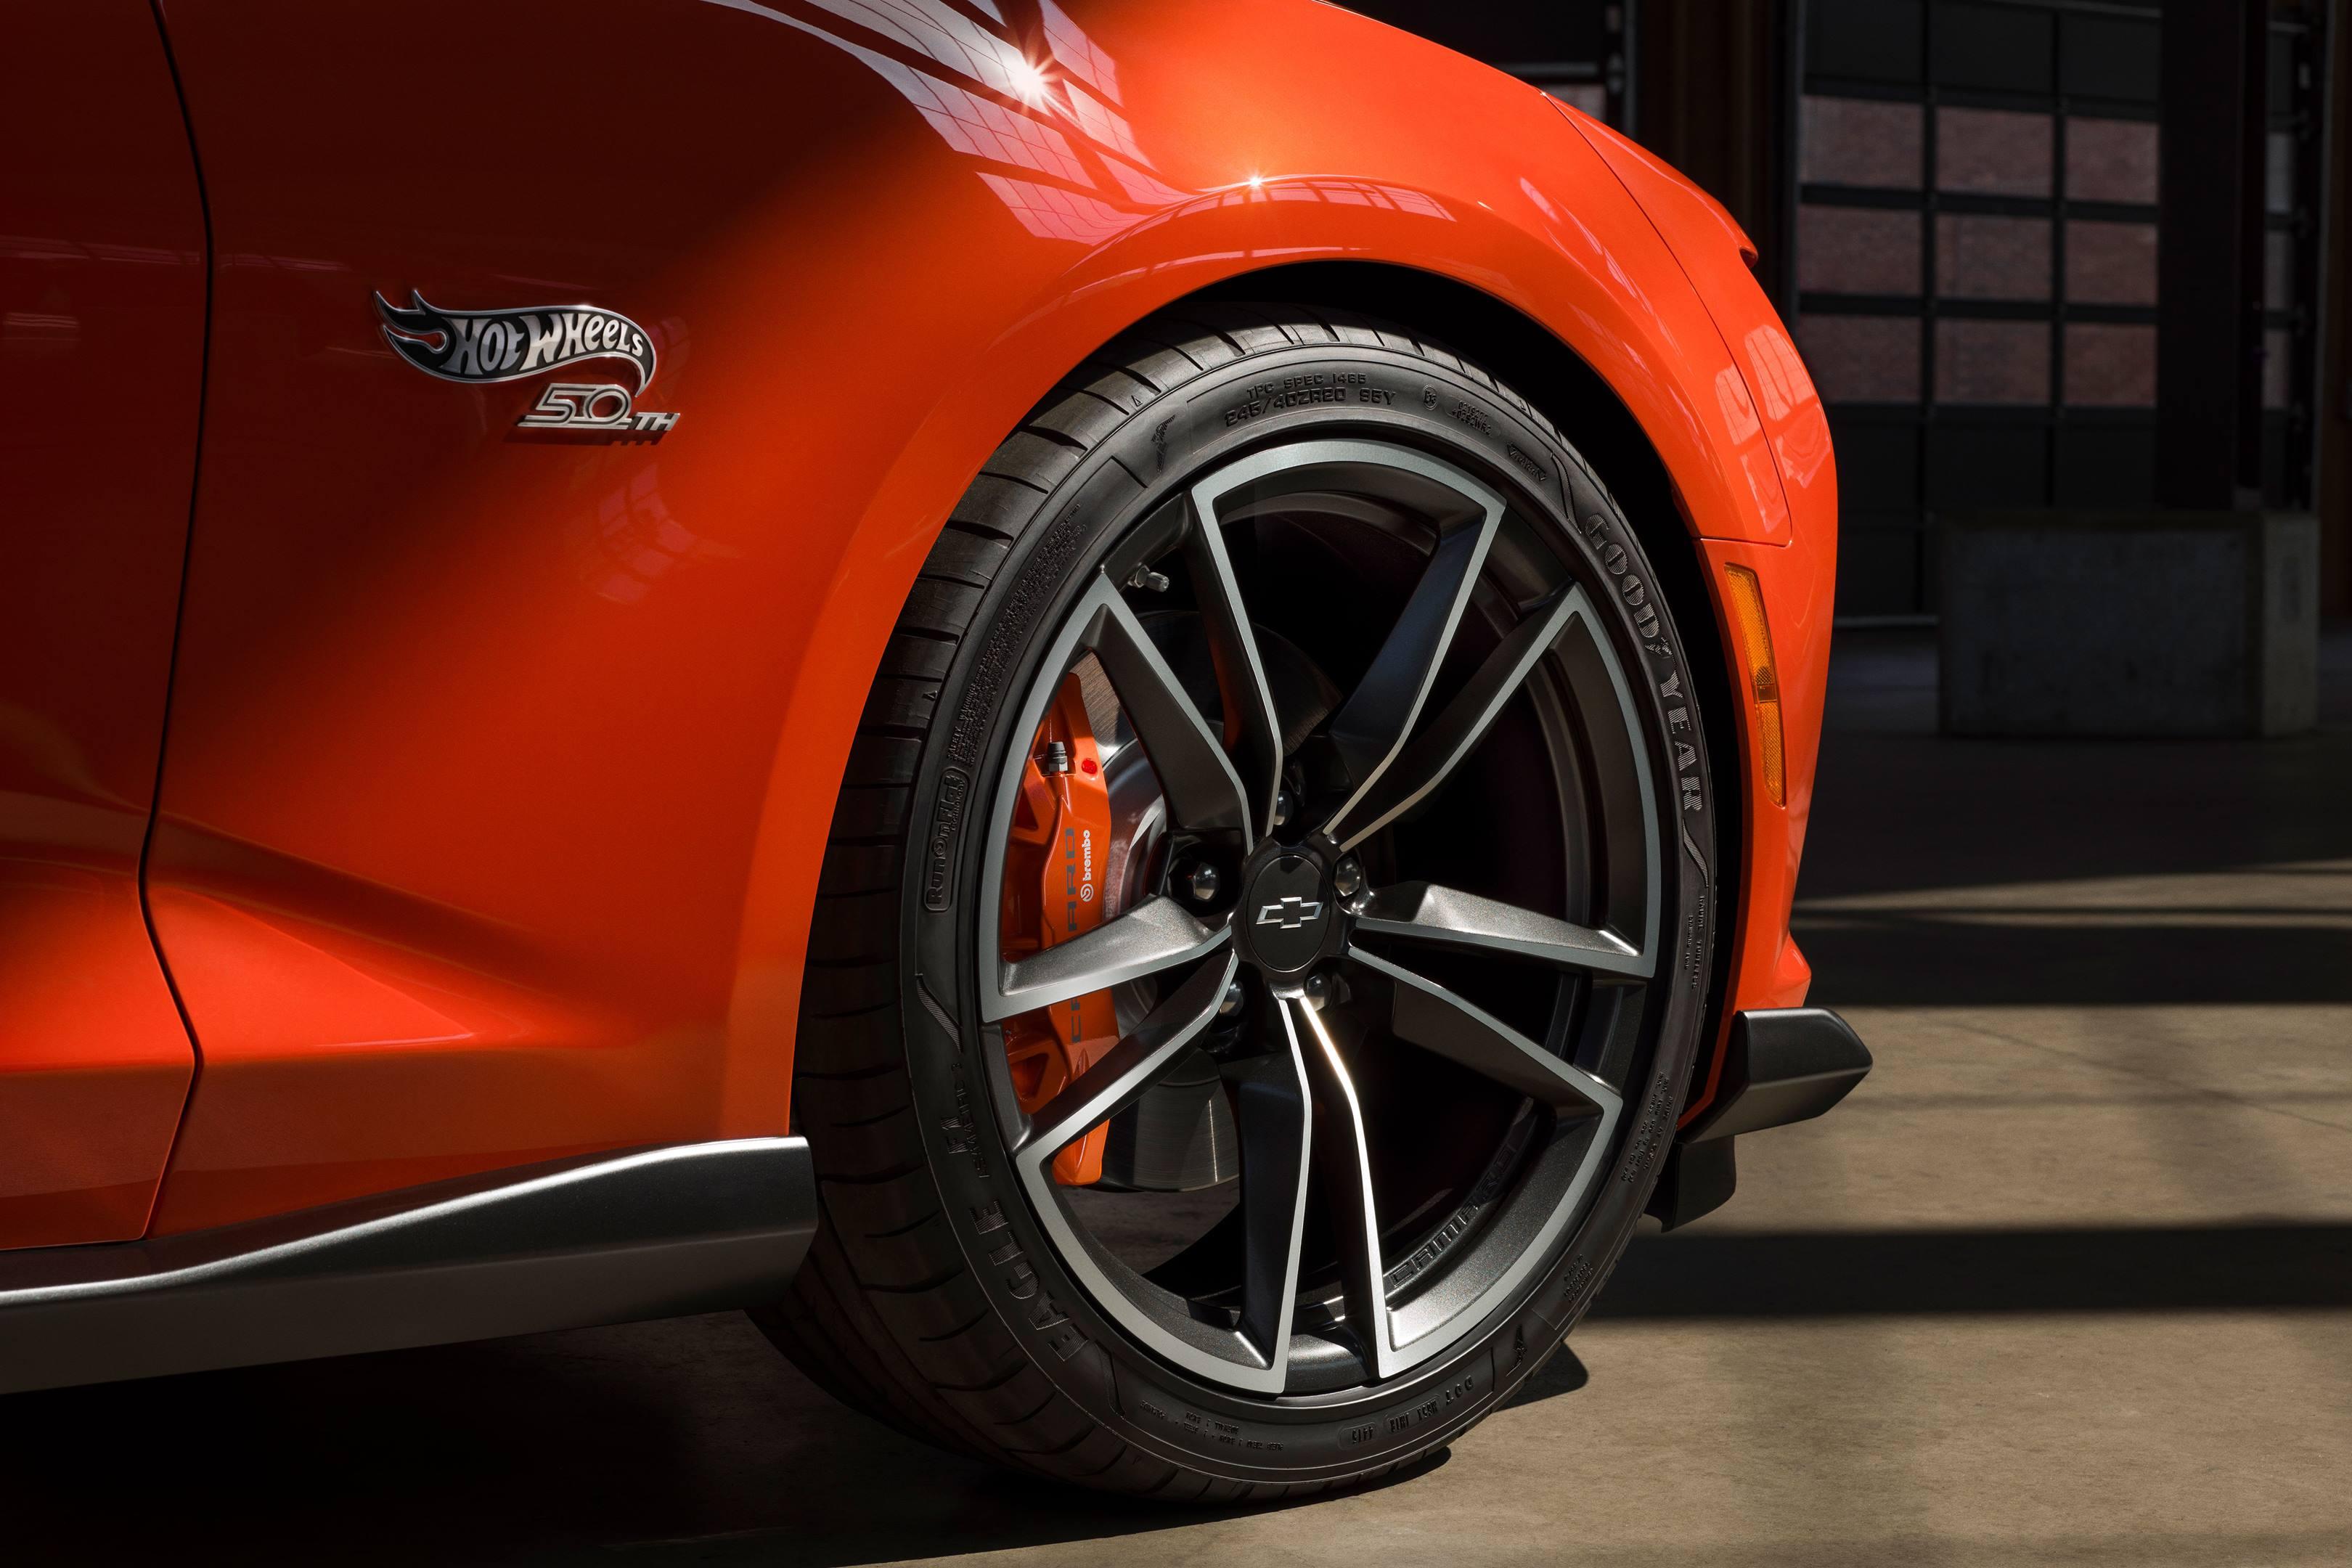 2017 SEMA Chevrolet Hot Wheels Camaro wheel detail